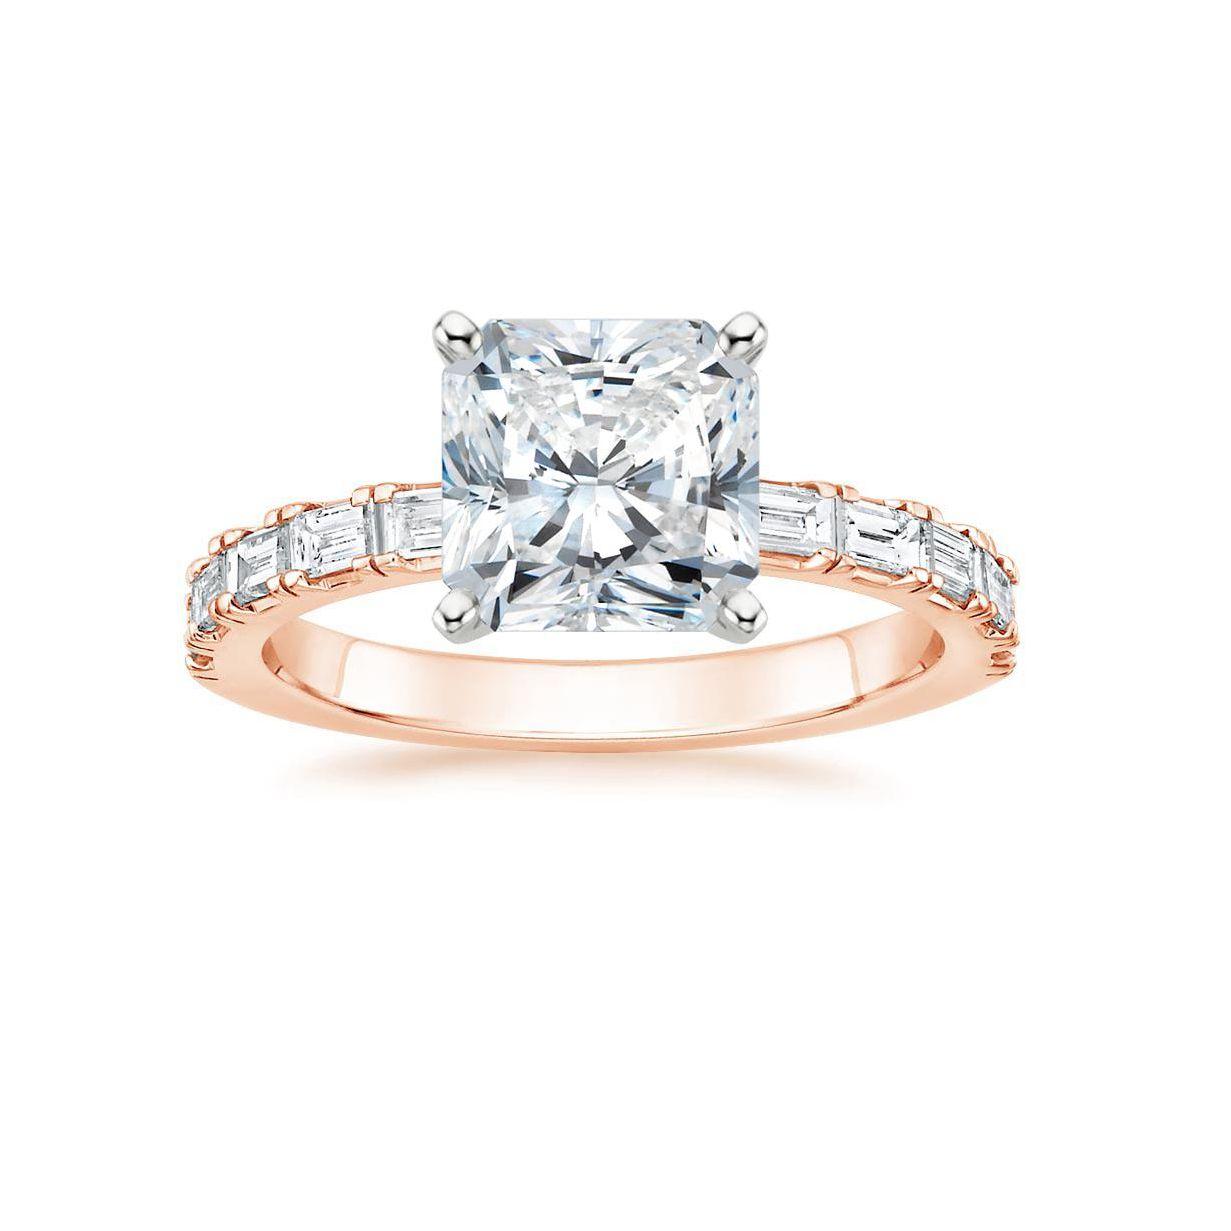 2 CT diamond halo engagement wedding ring band set 14k rose gold antique bridal